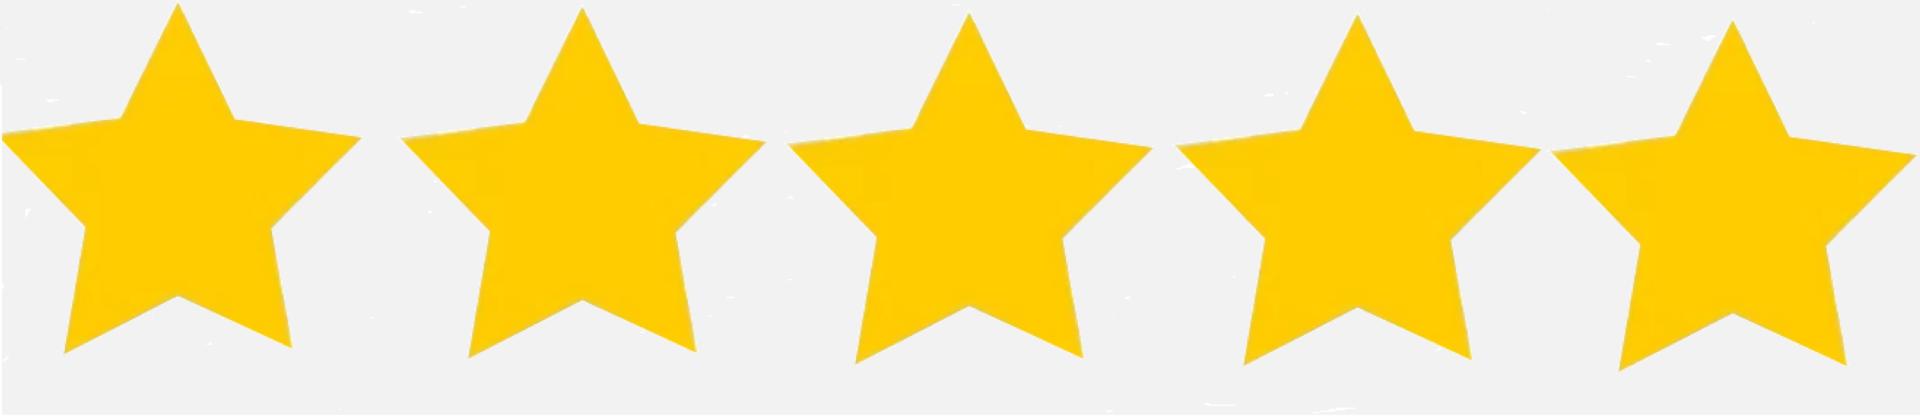 Star3 5x